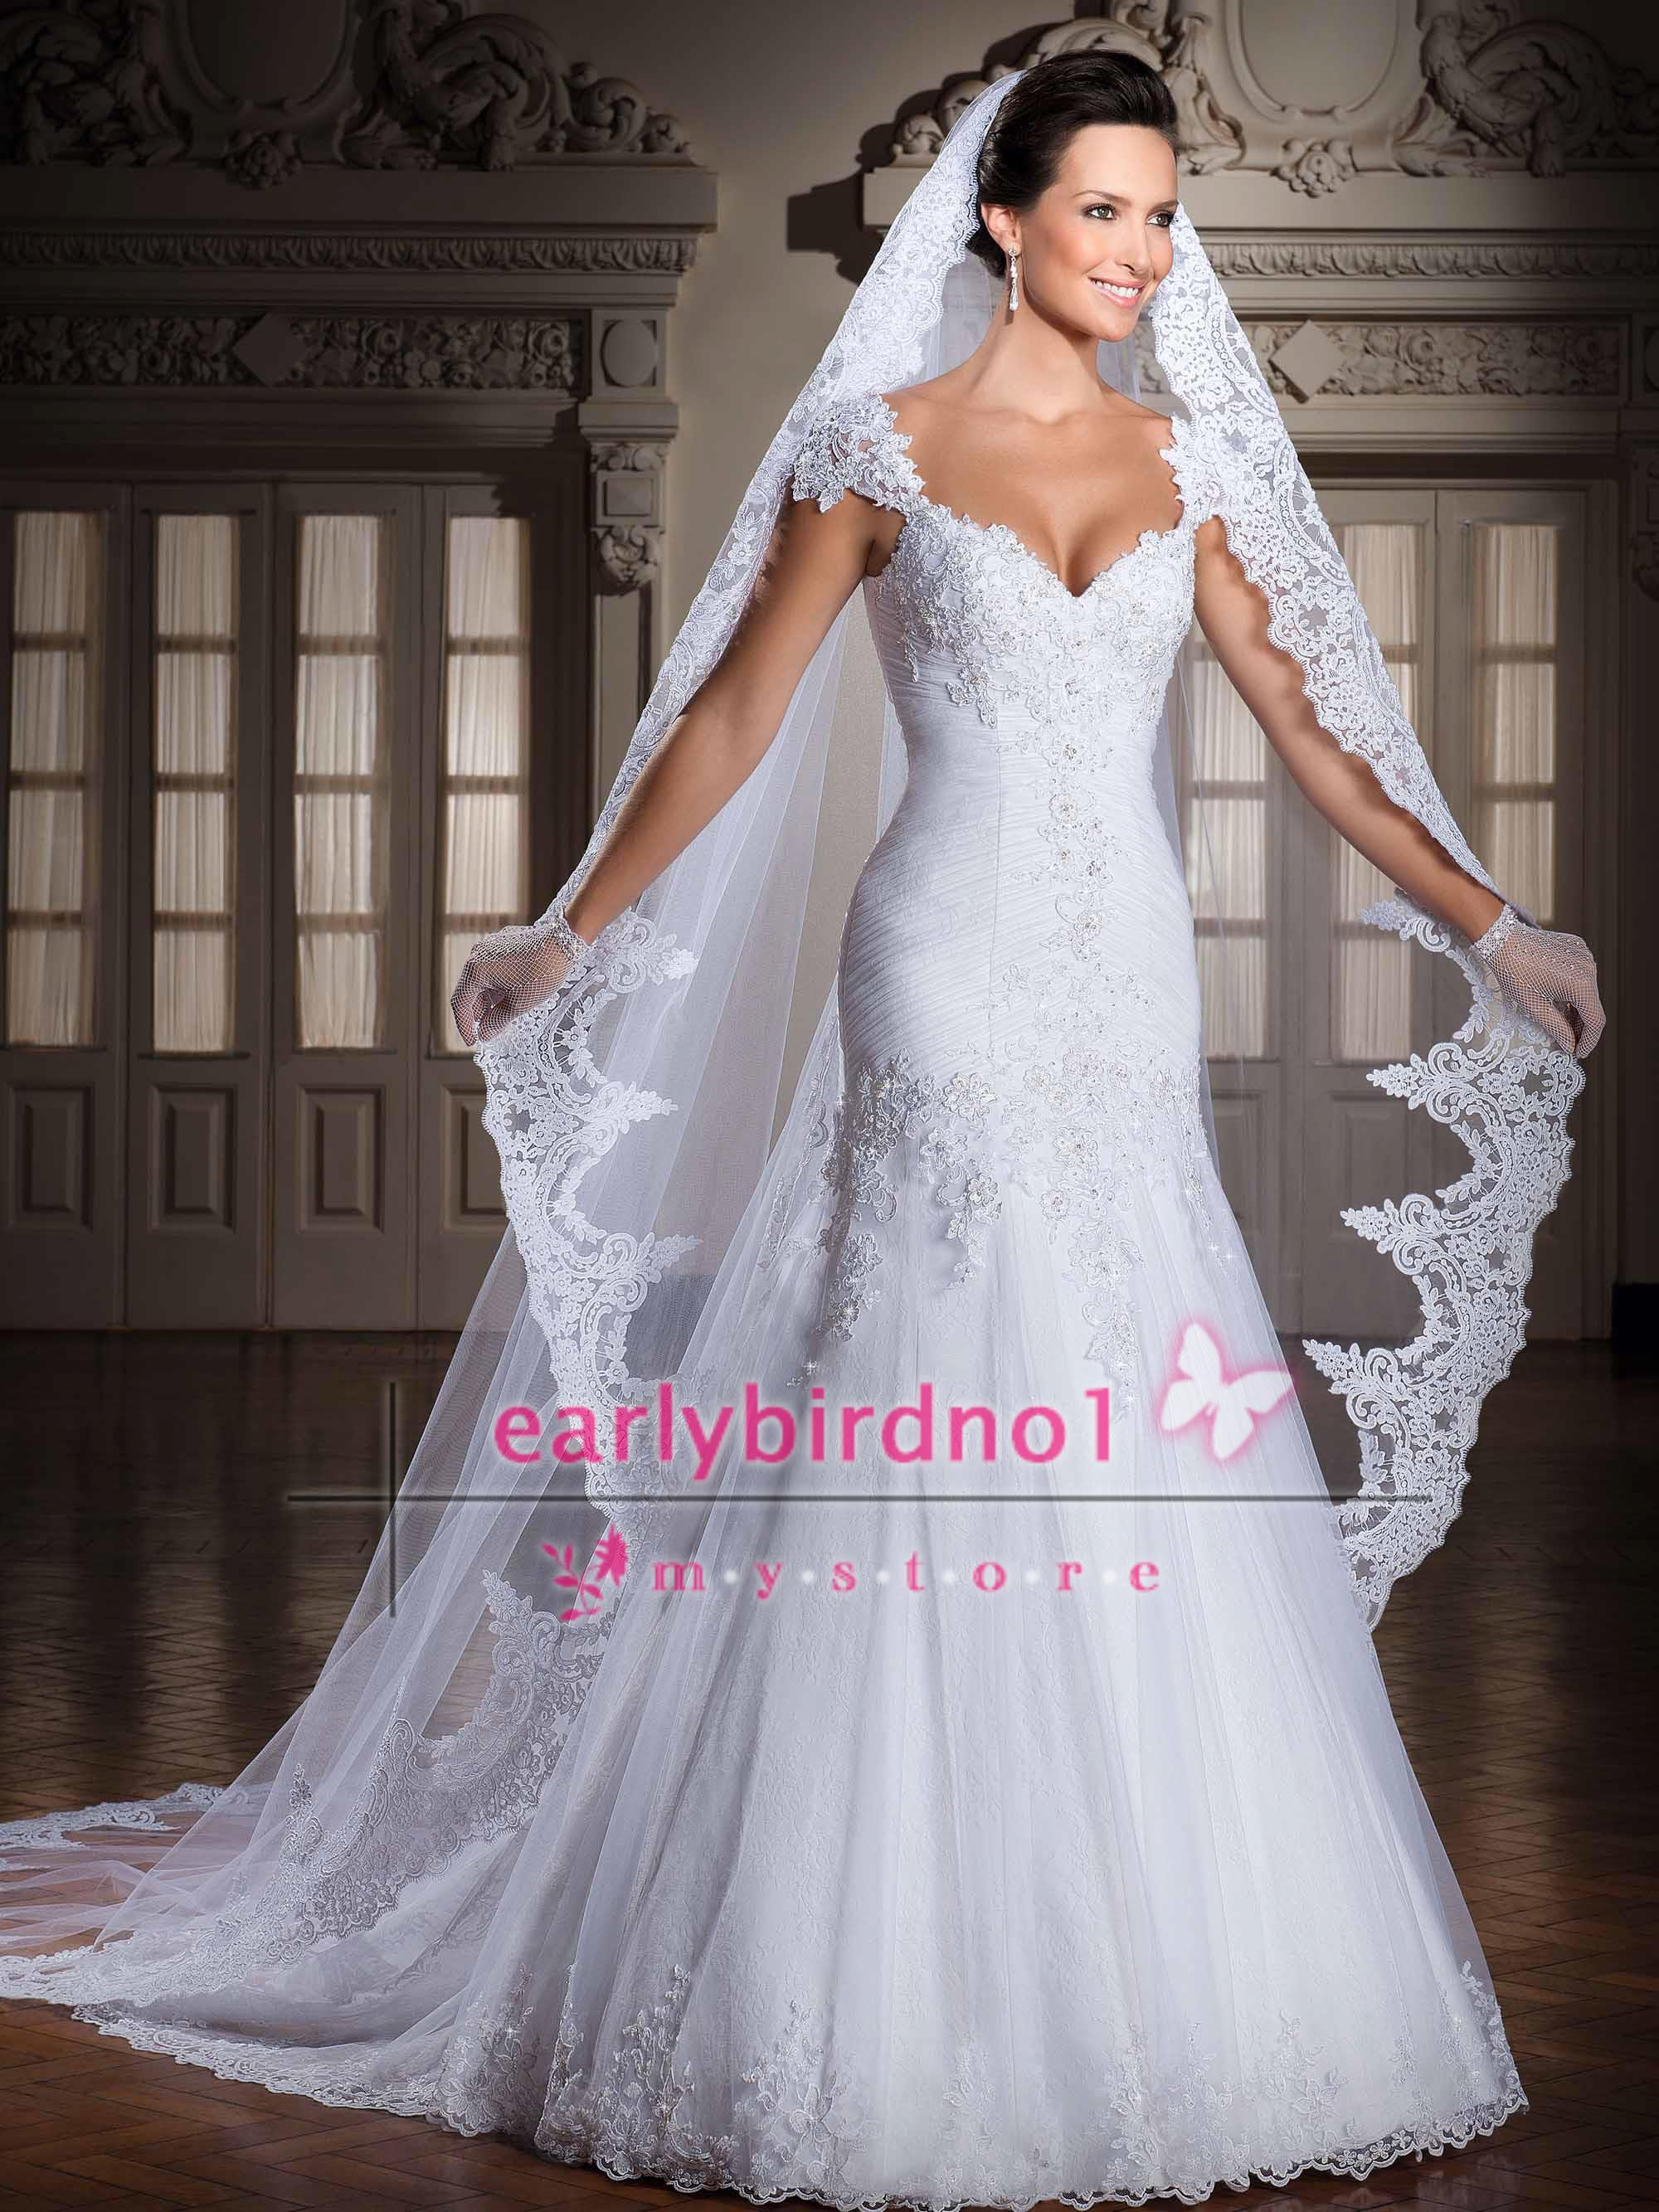 Vestidos de novia hermosos con velo